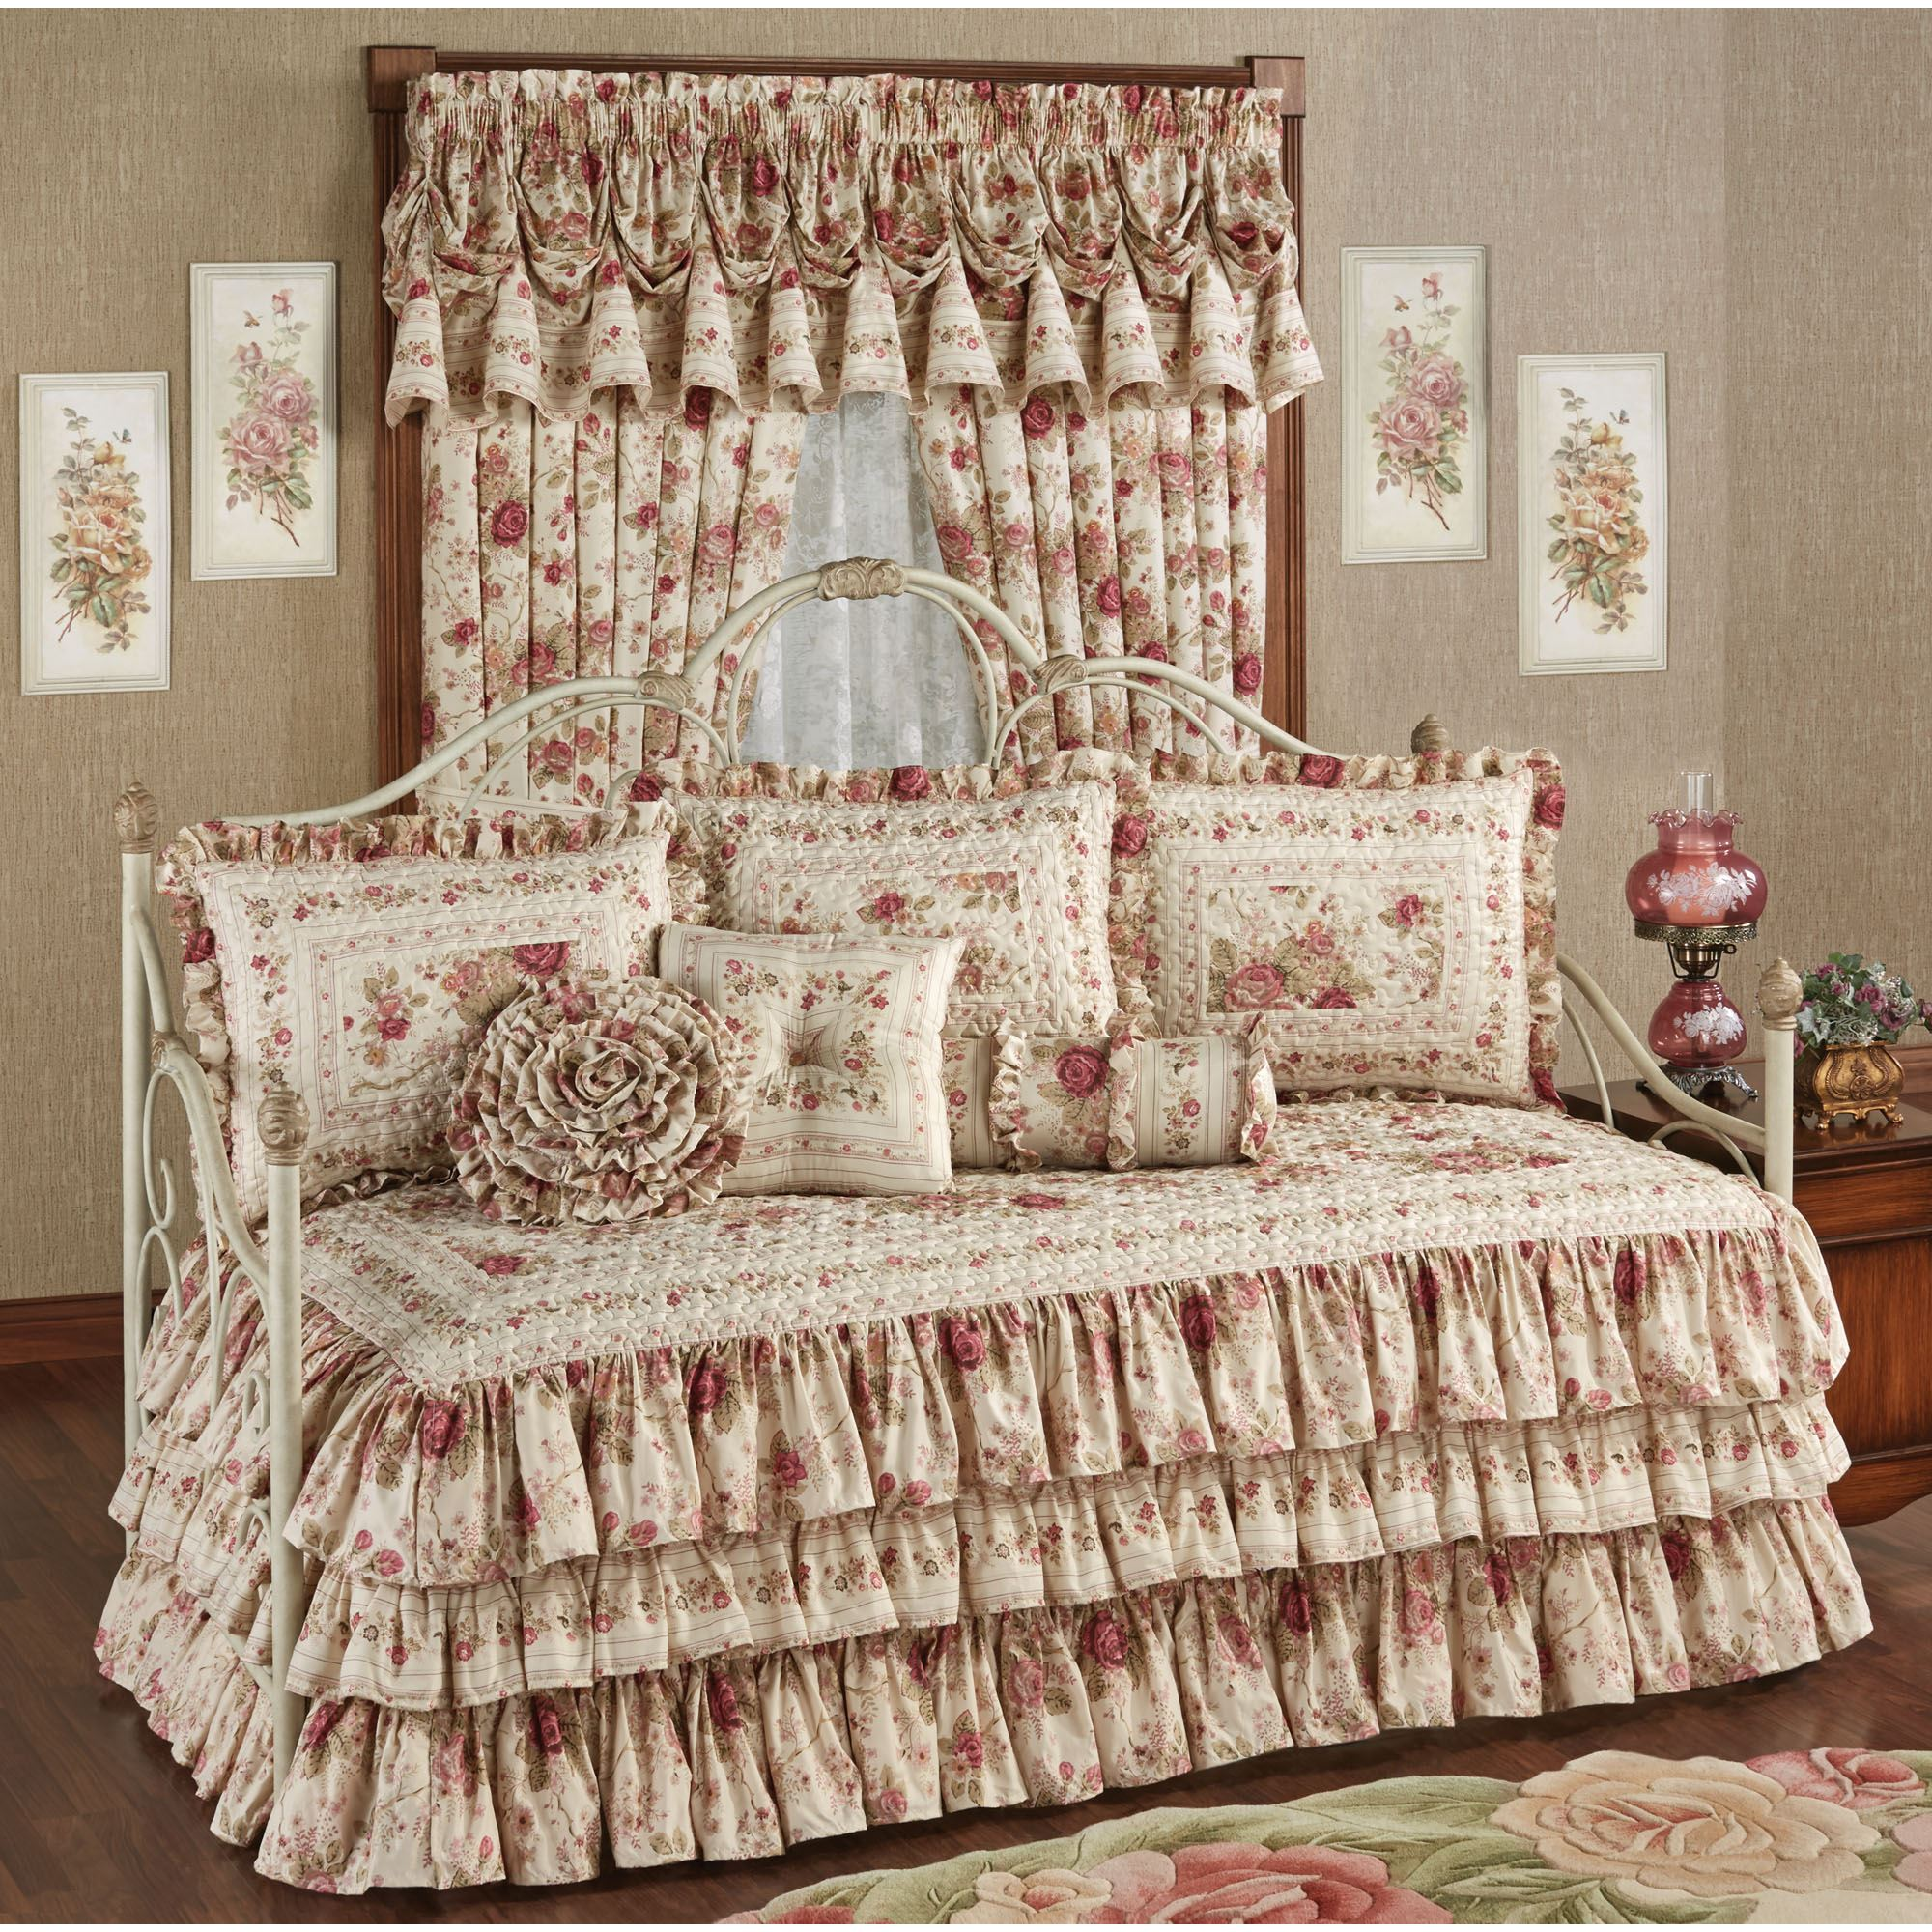 Heirloom Rose Floral Ruffled Daybed Bedding Set